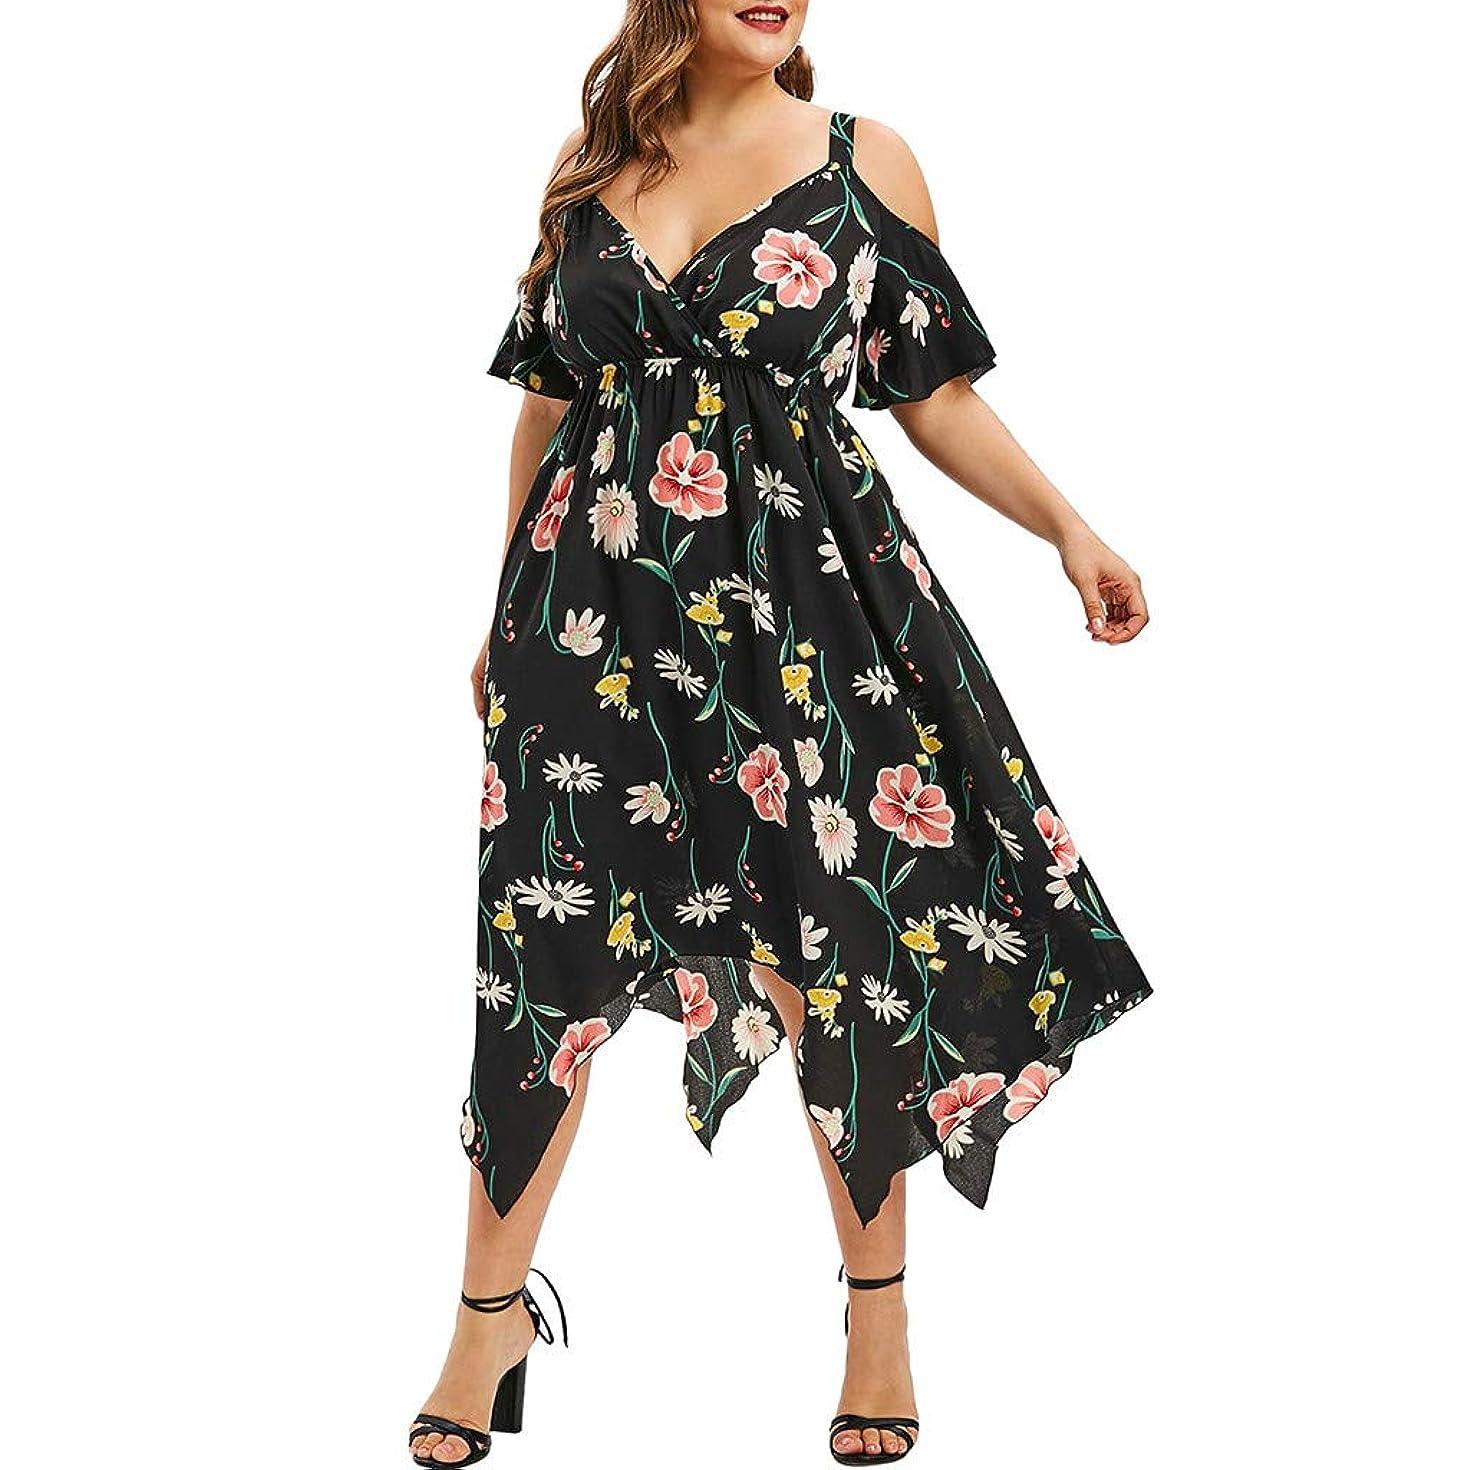 Women Summer Plus Size Boho Floral Dress Casual Short Sleeve Cold Shoulder Sling Beach Long Maxi Dresses